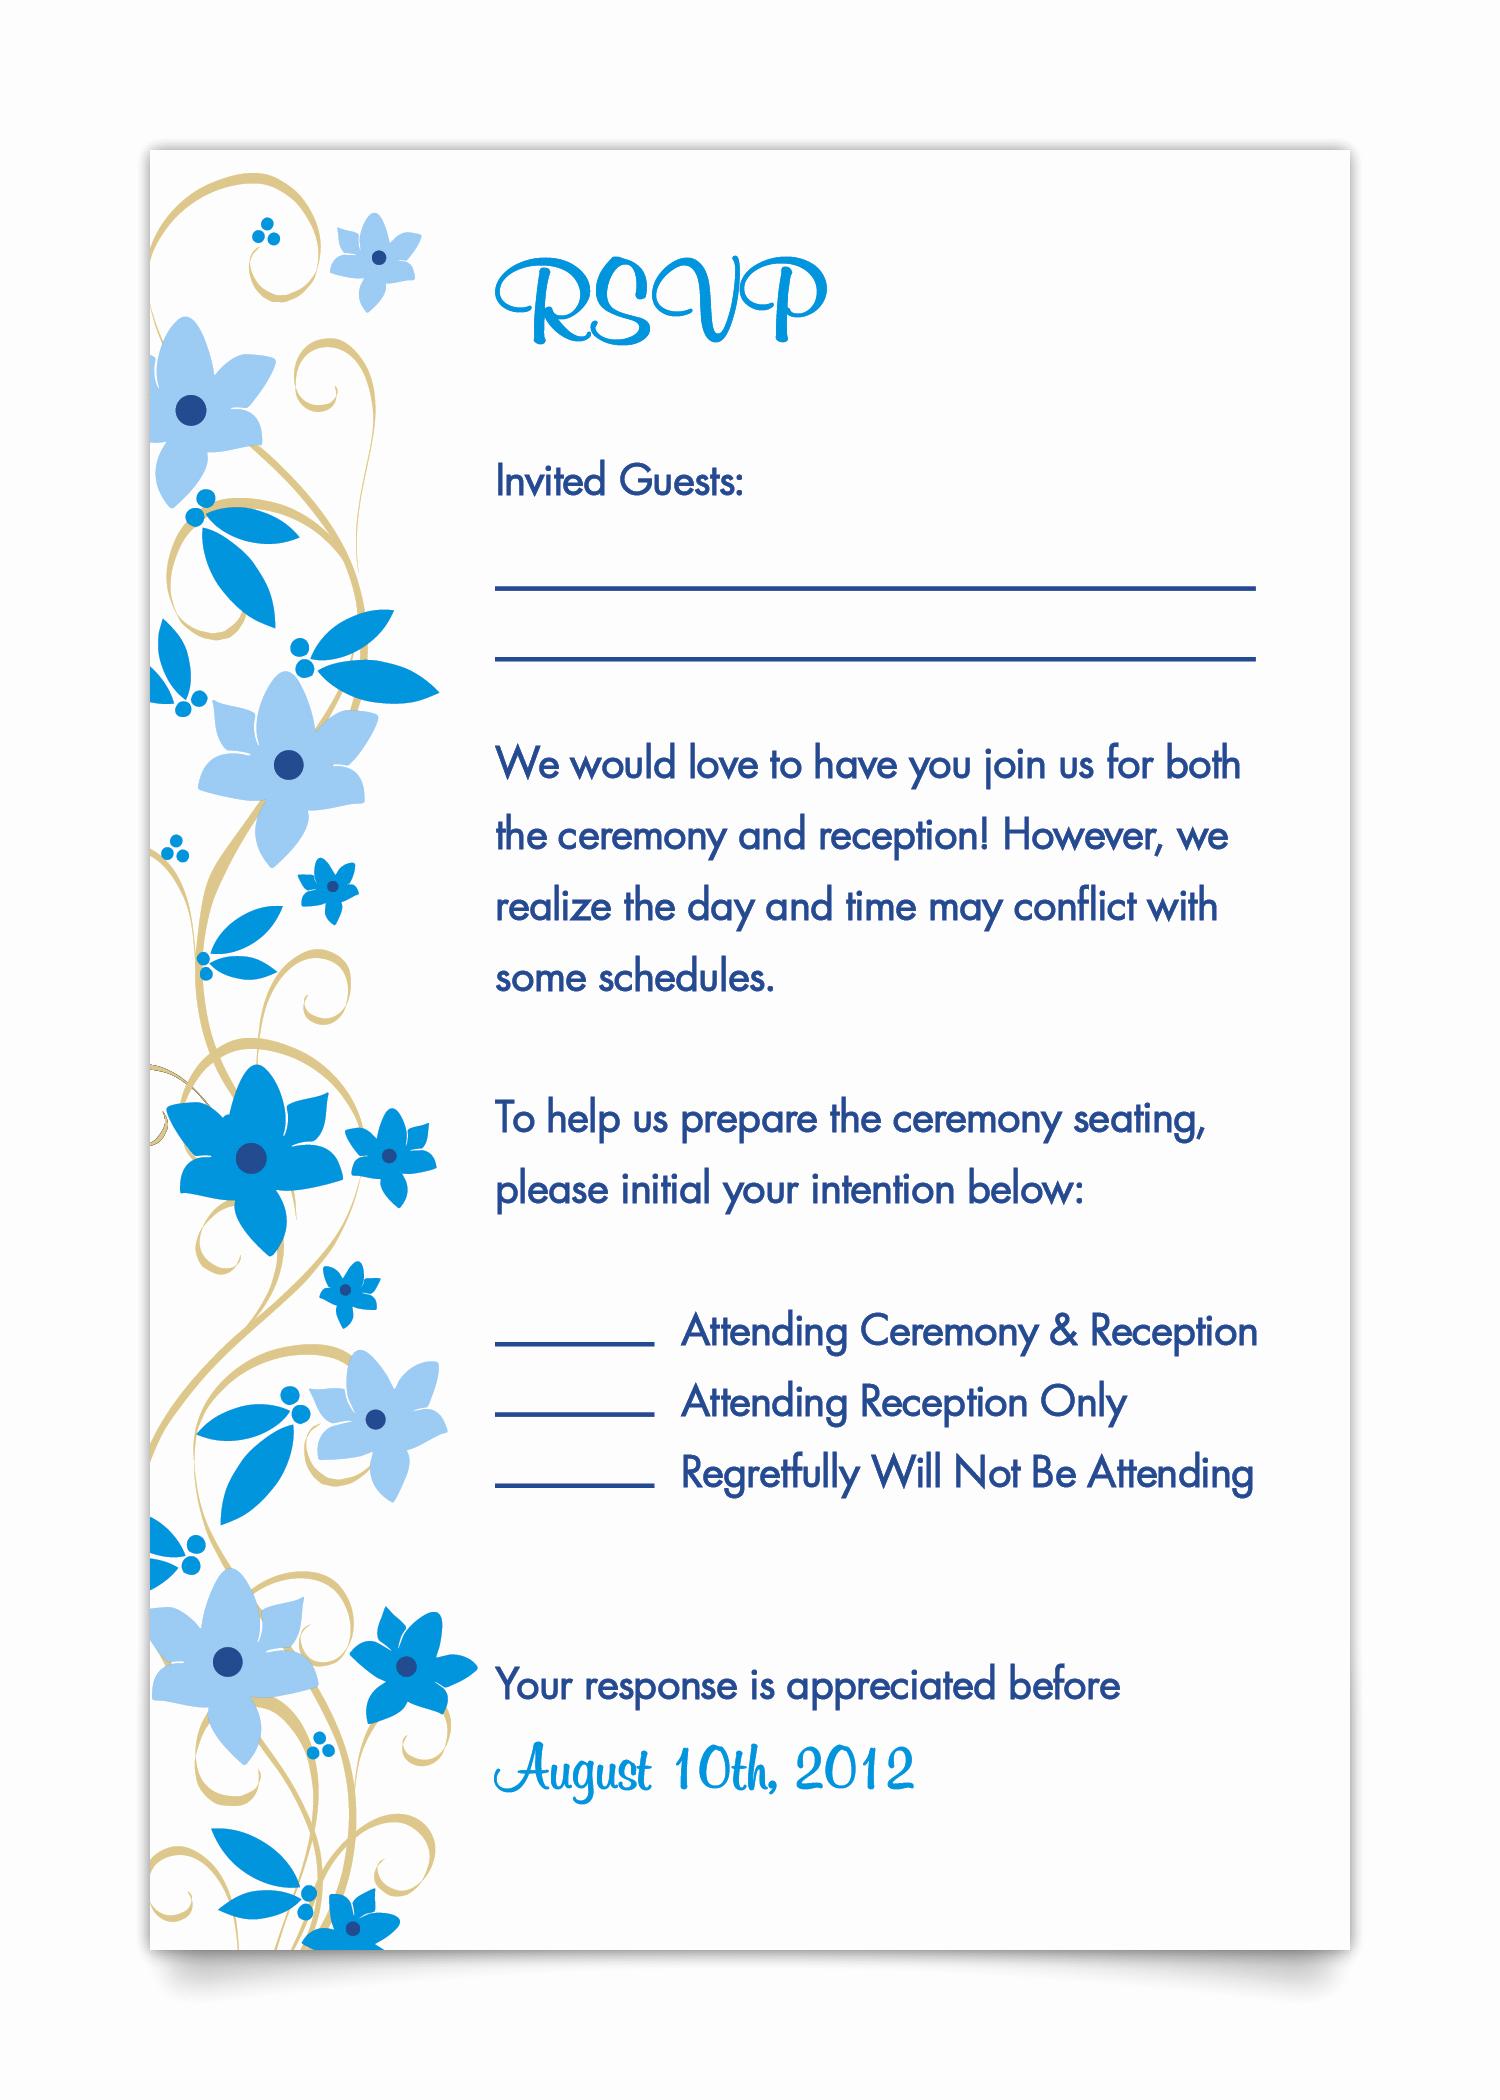 Rsvp Wedding Invitation Wording Elegant Adults Ly Wedding Wordingadults Ly Wedding Wording